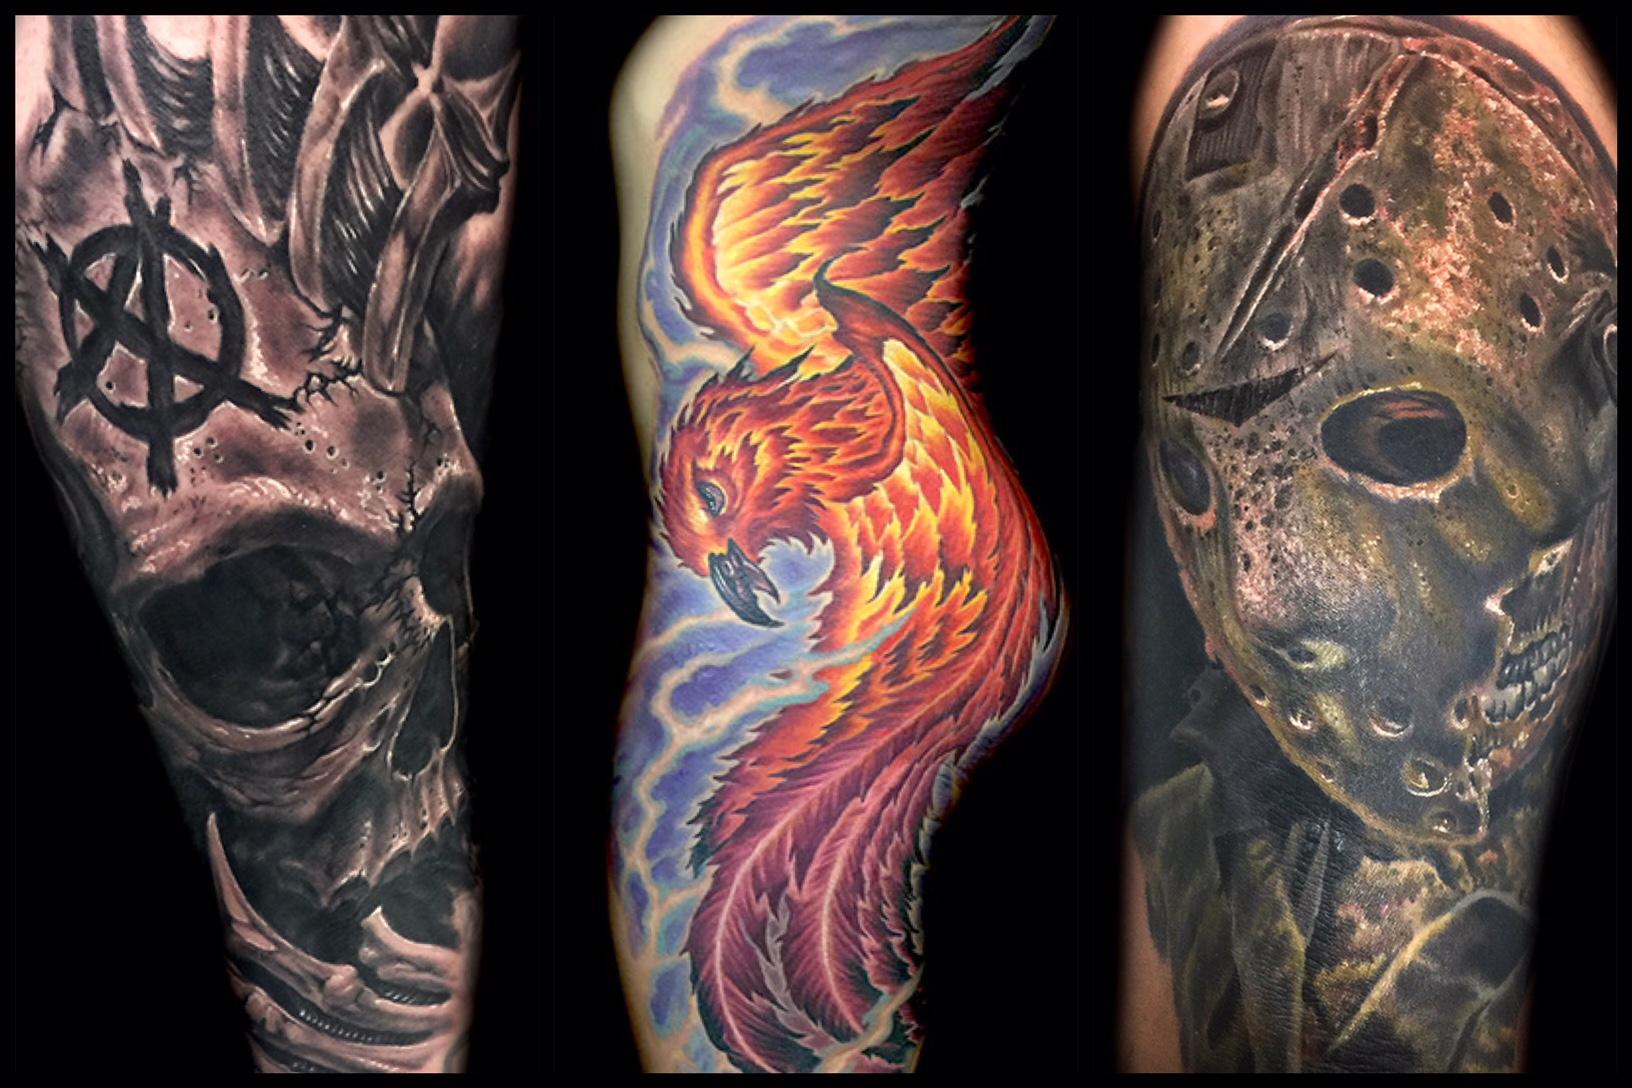 Best Las Vegas Tattoo Shops | Inner Visions Tattoo | Las Vegas Tattoos